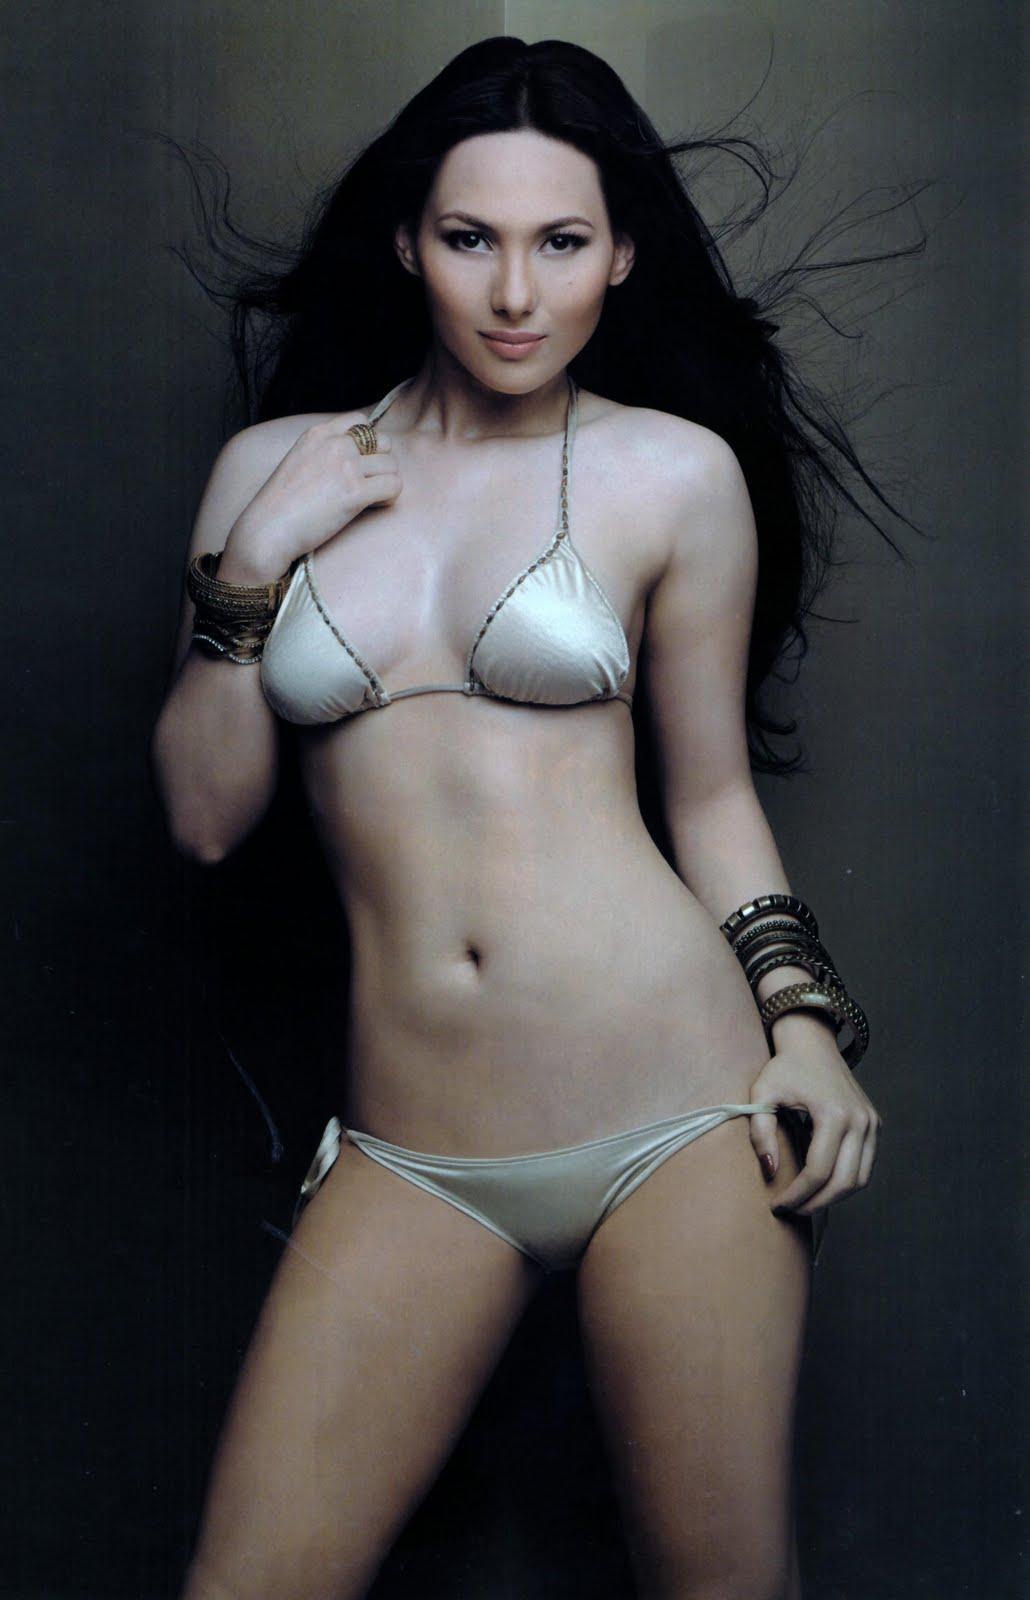 kristel moreno sexy bikini pics 02